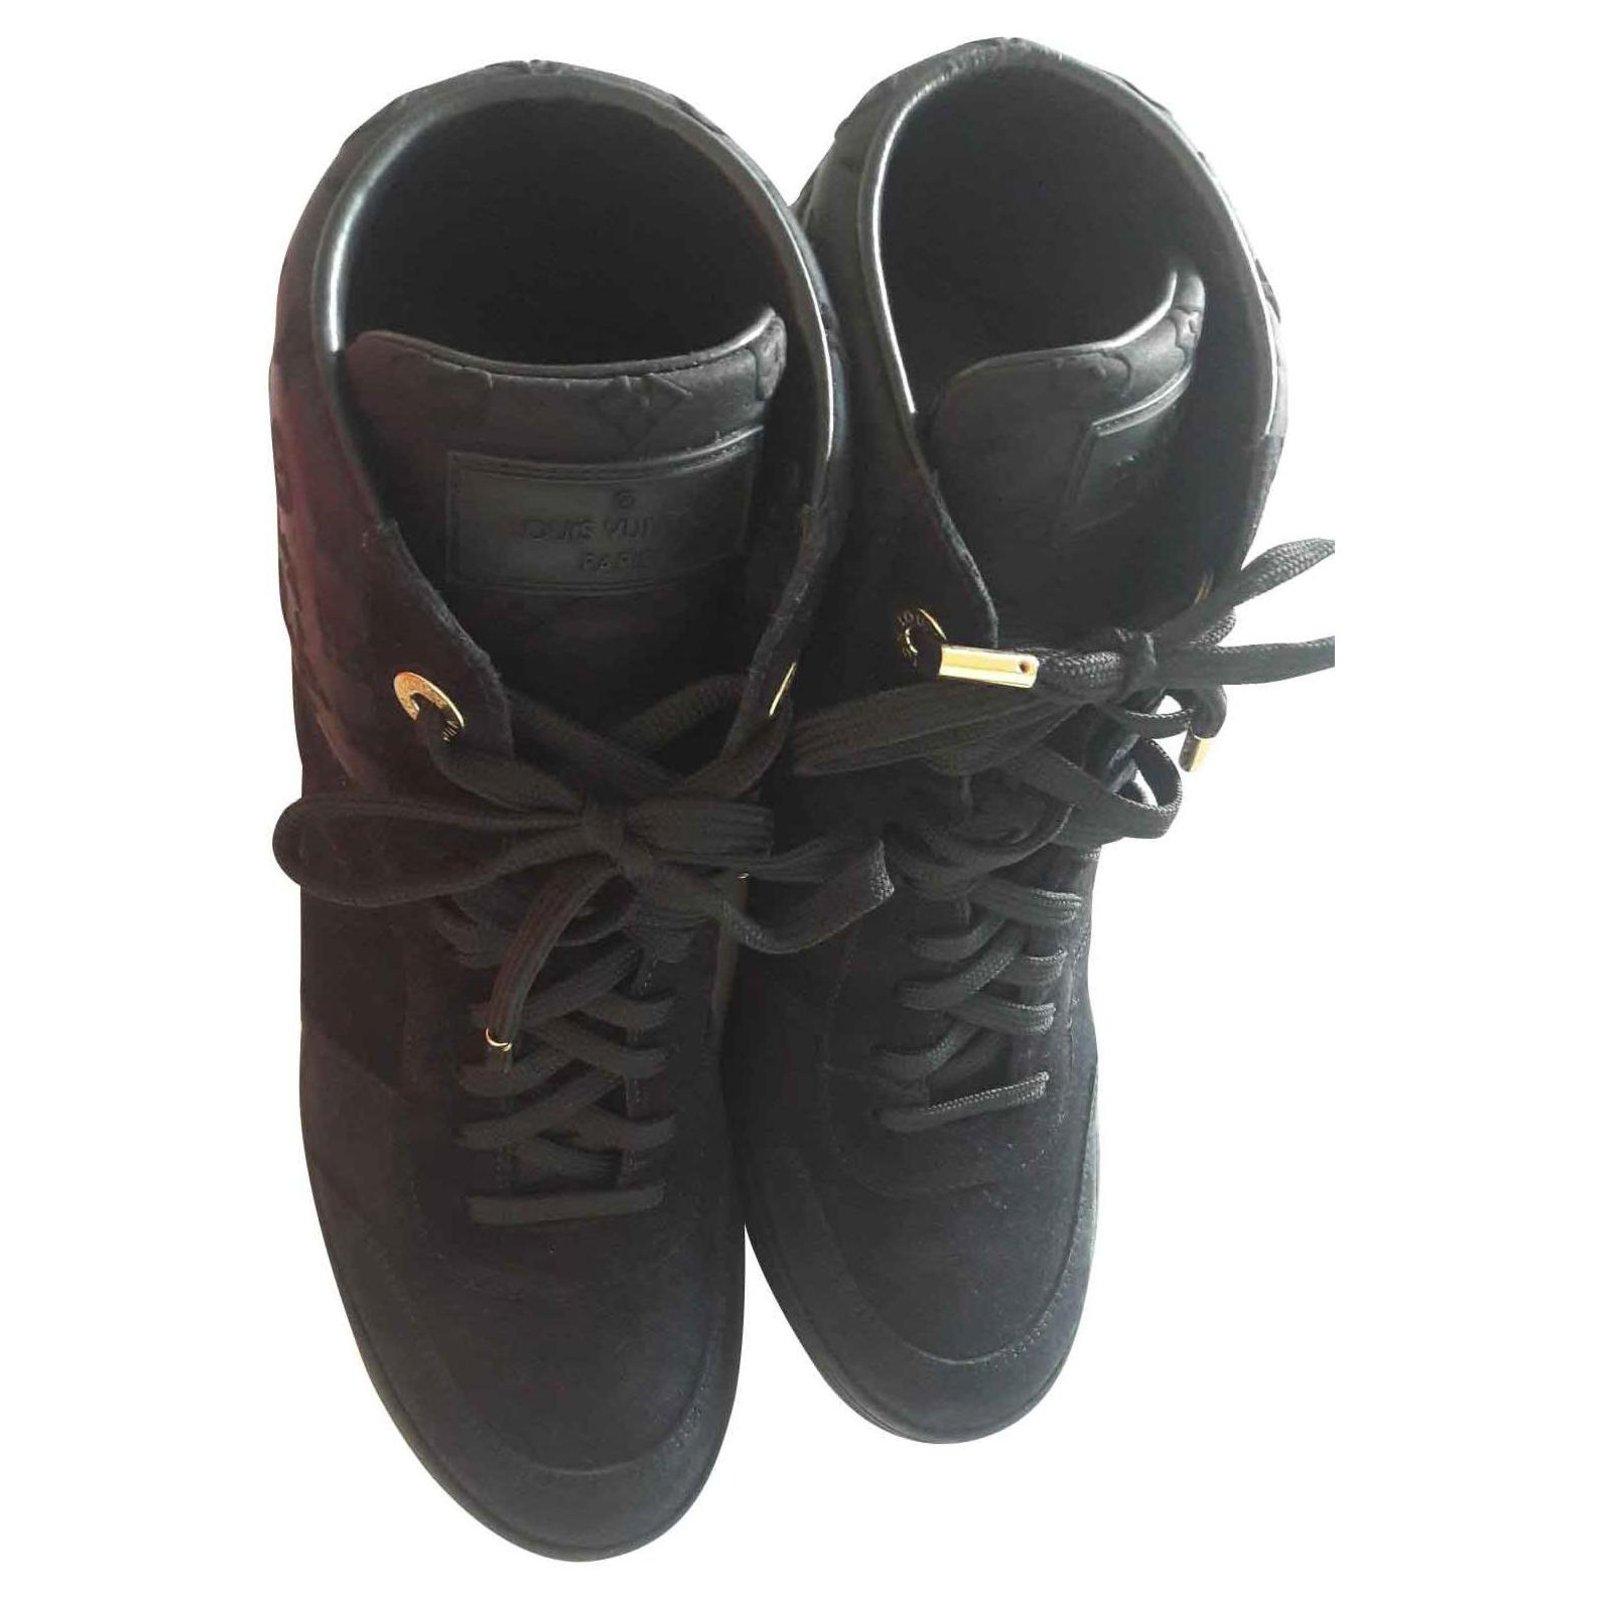 Louis Vuitton Millenium wedge sneakers